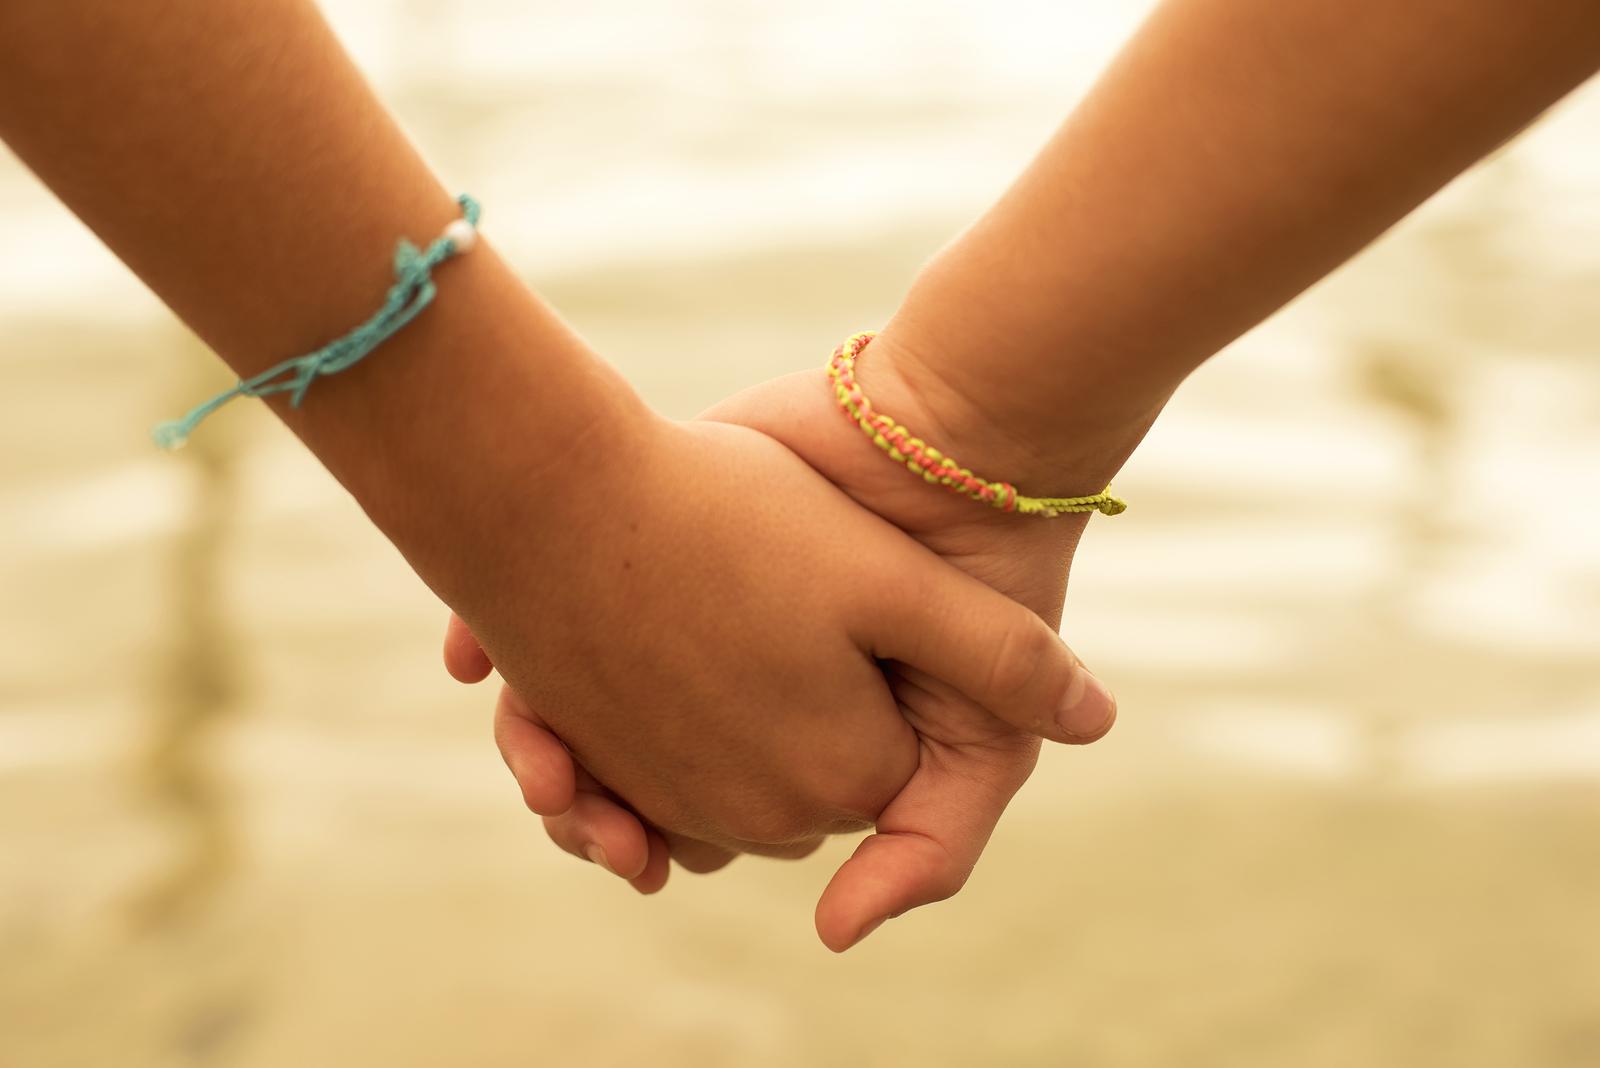 Rainy Day Fun: How to Make Kumihimo Friendship Bracelets